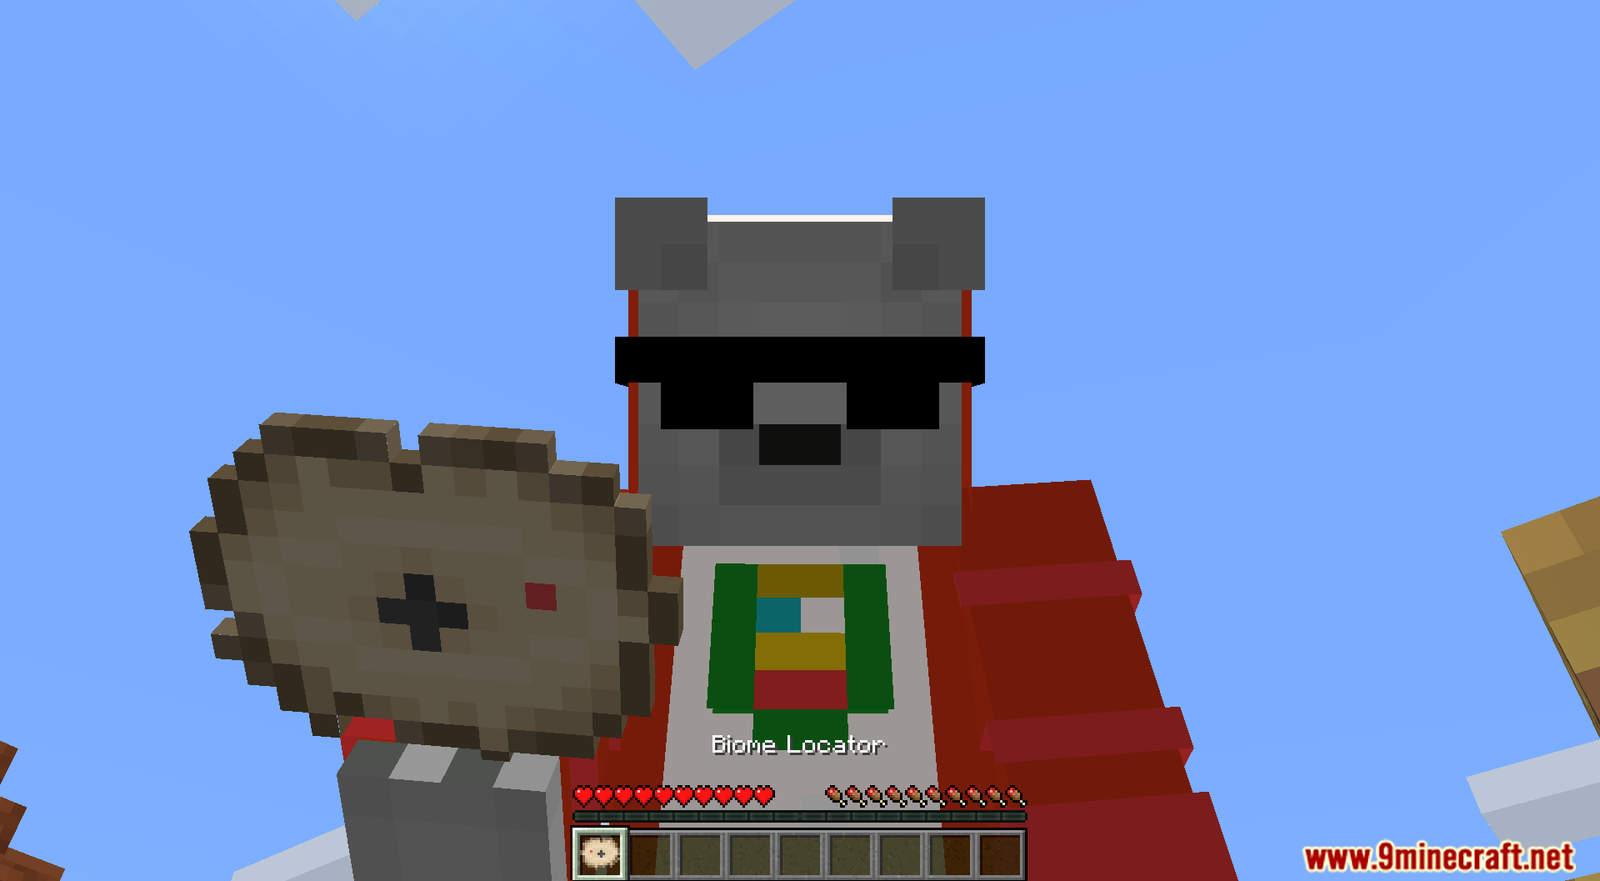 Biome Locator mod for Minecraft (4)